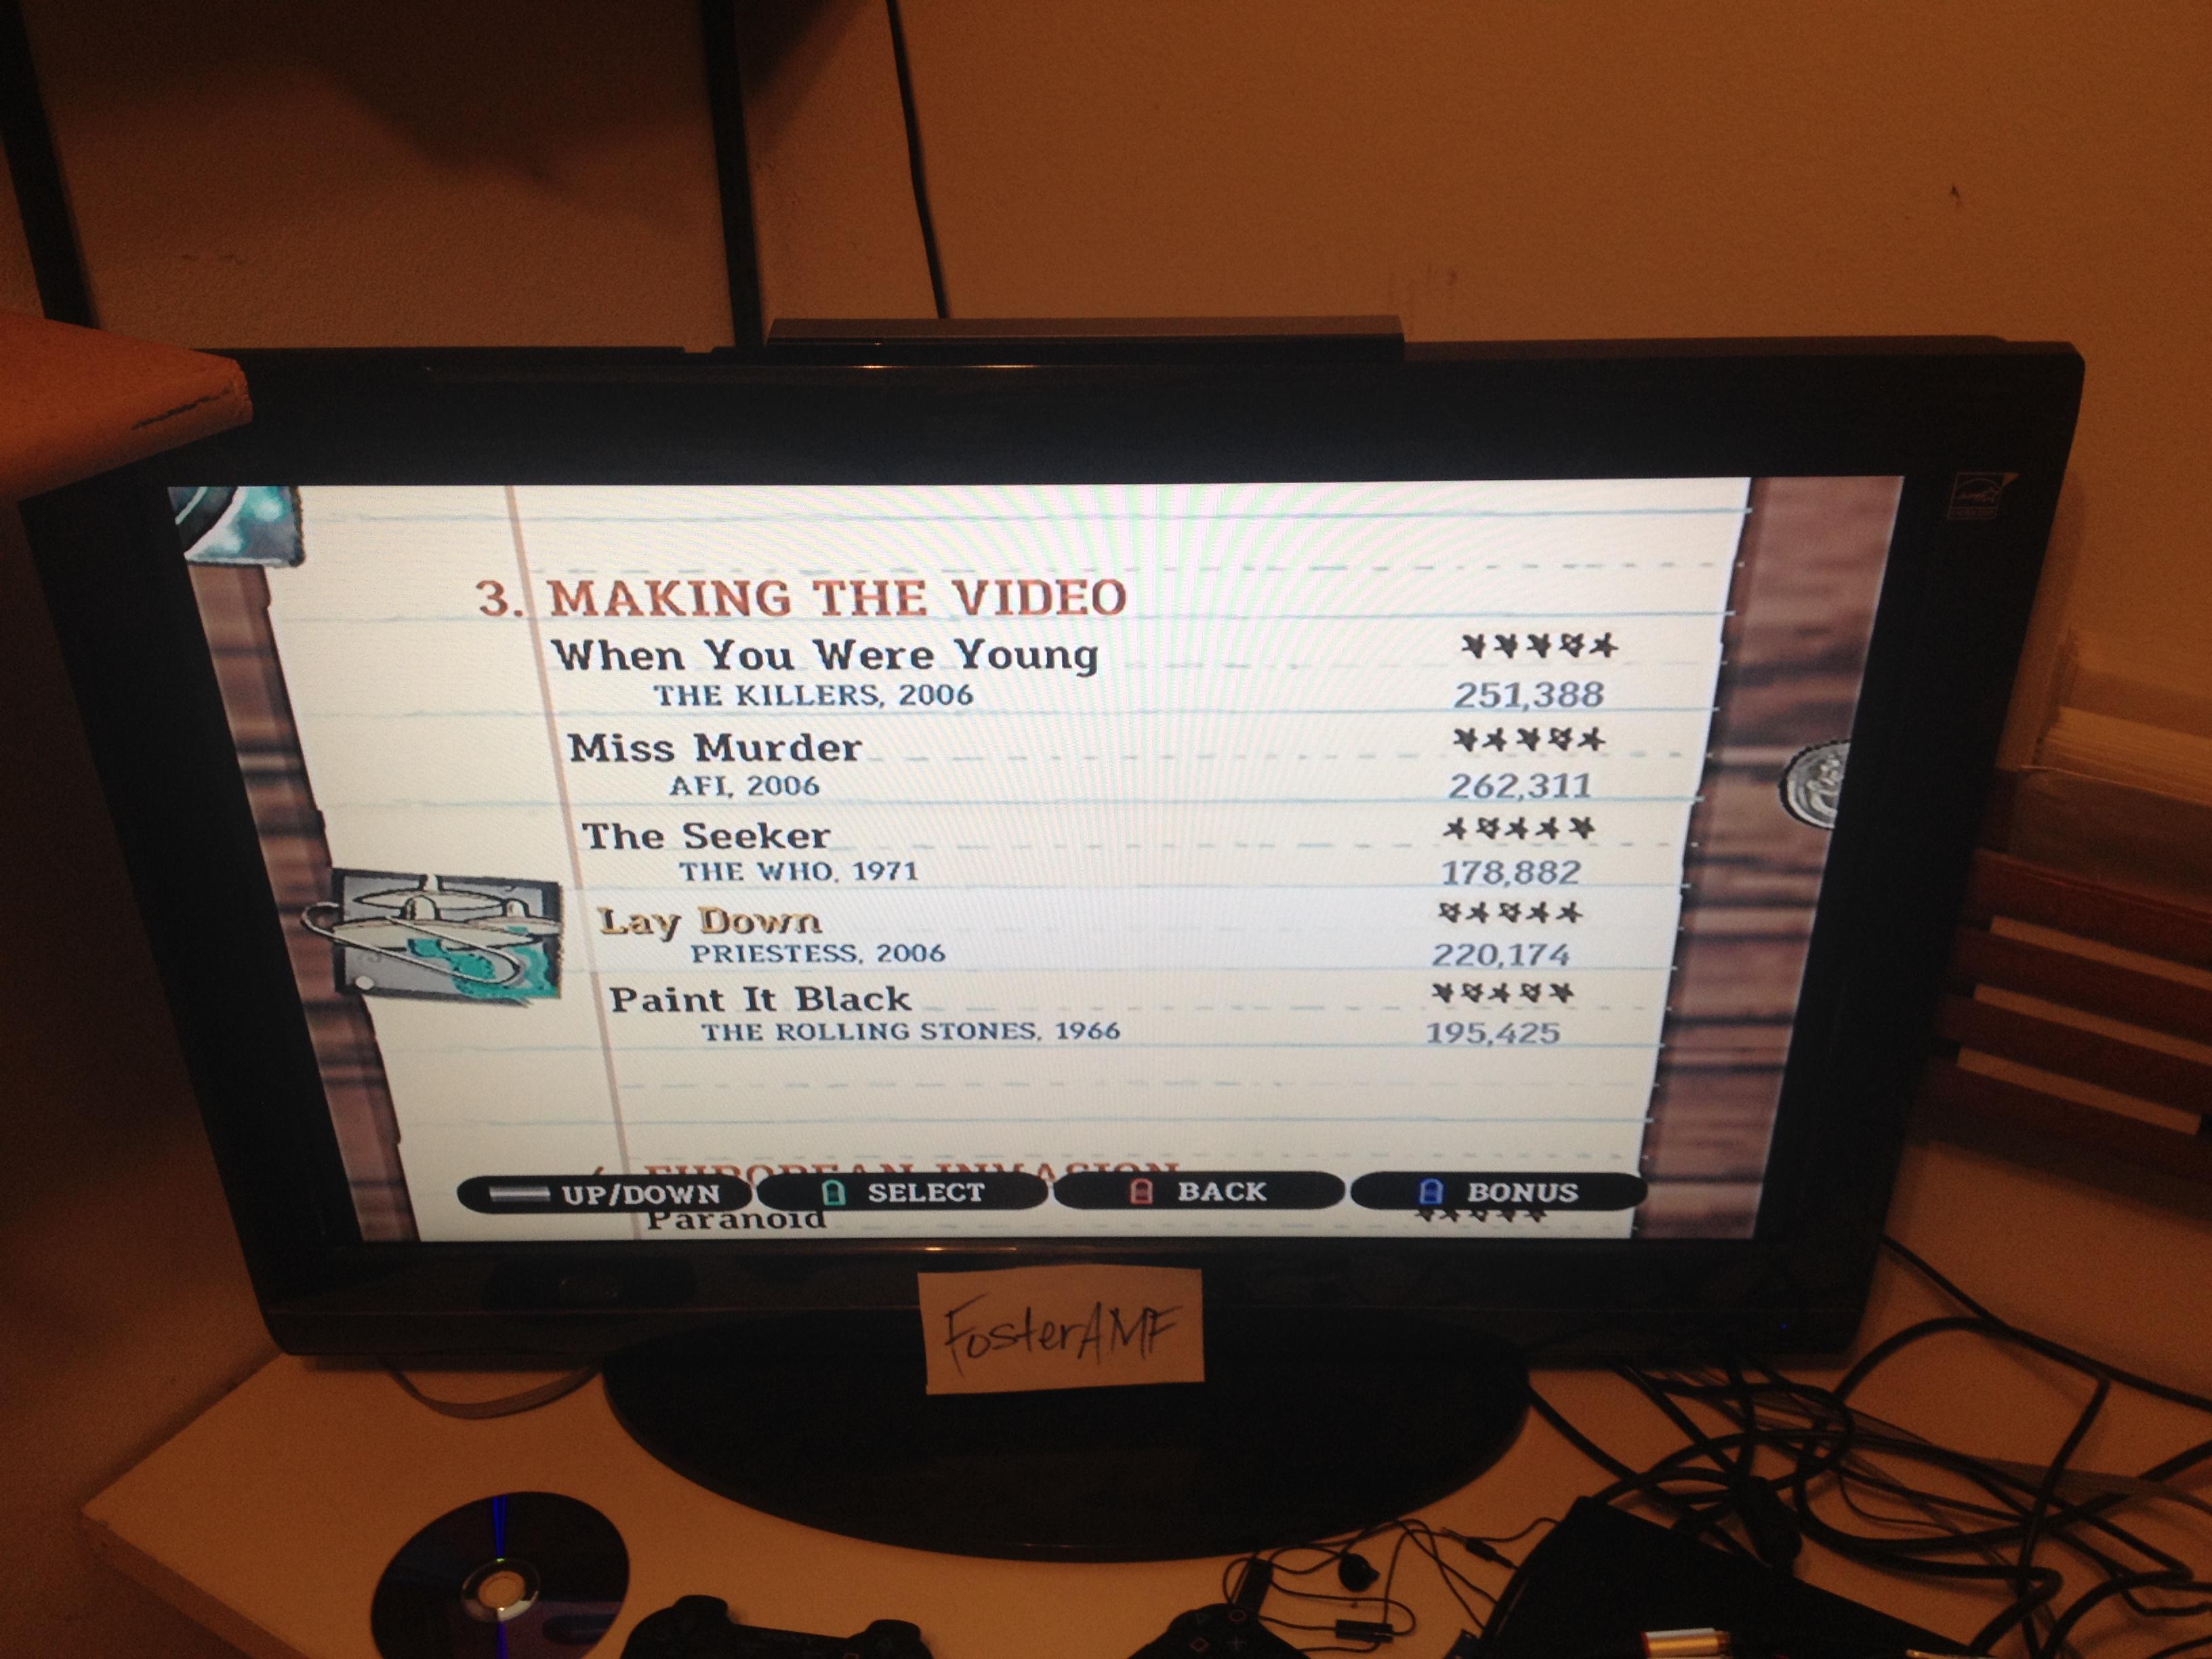 "FosterAMF: Guitar Hero III: Legends of Rock: ""Miss Murder"" [Expert] (Wii) 262,311 points on 2015-04-19 00:14:30"